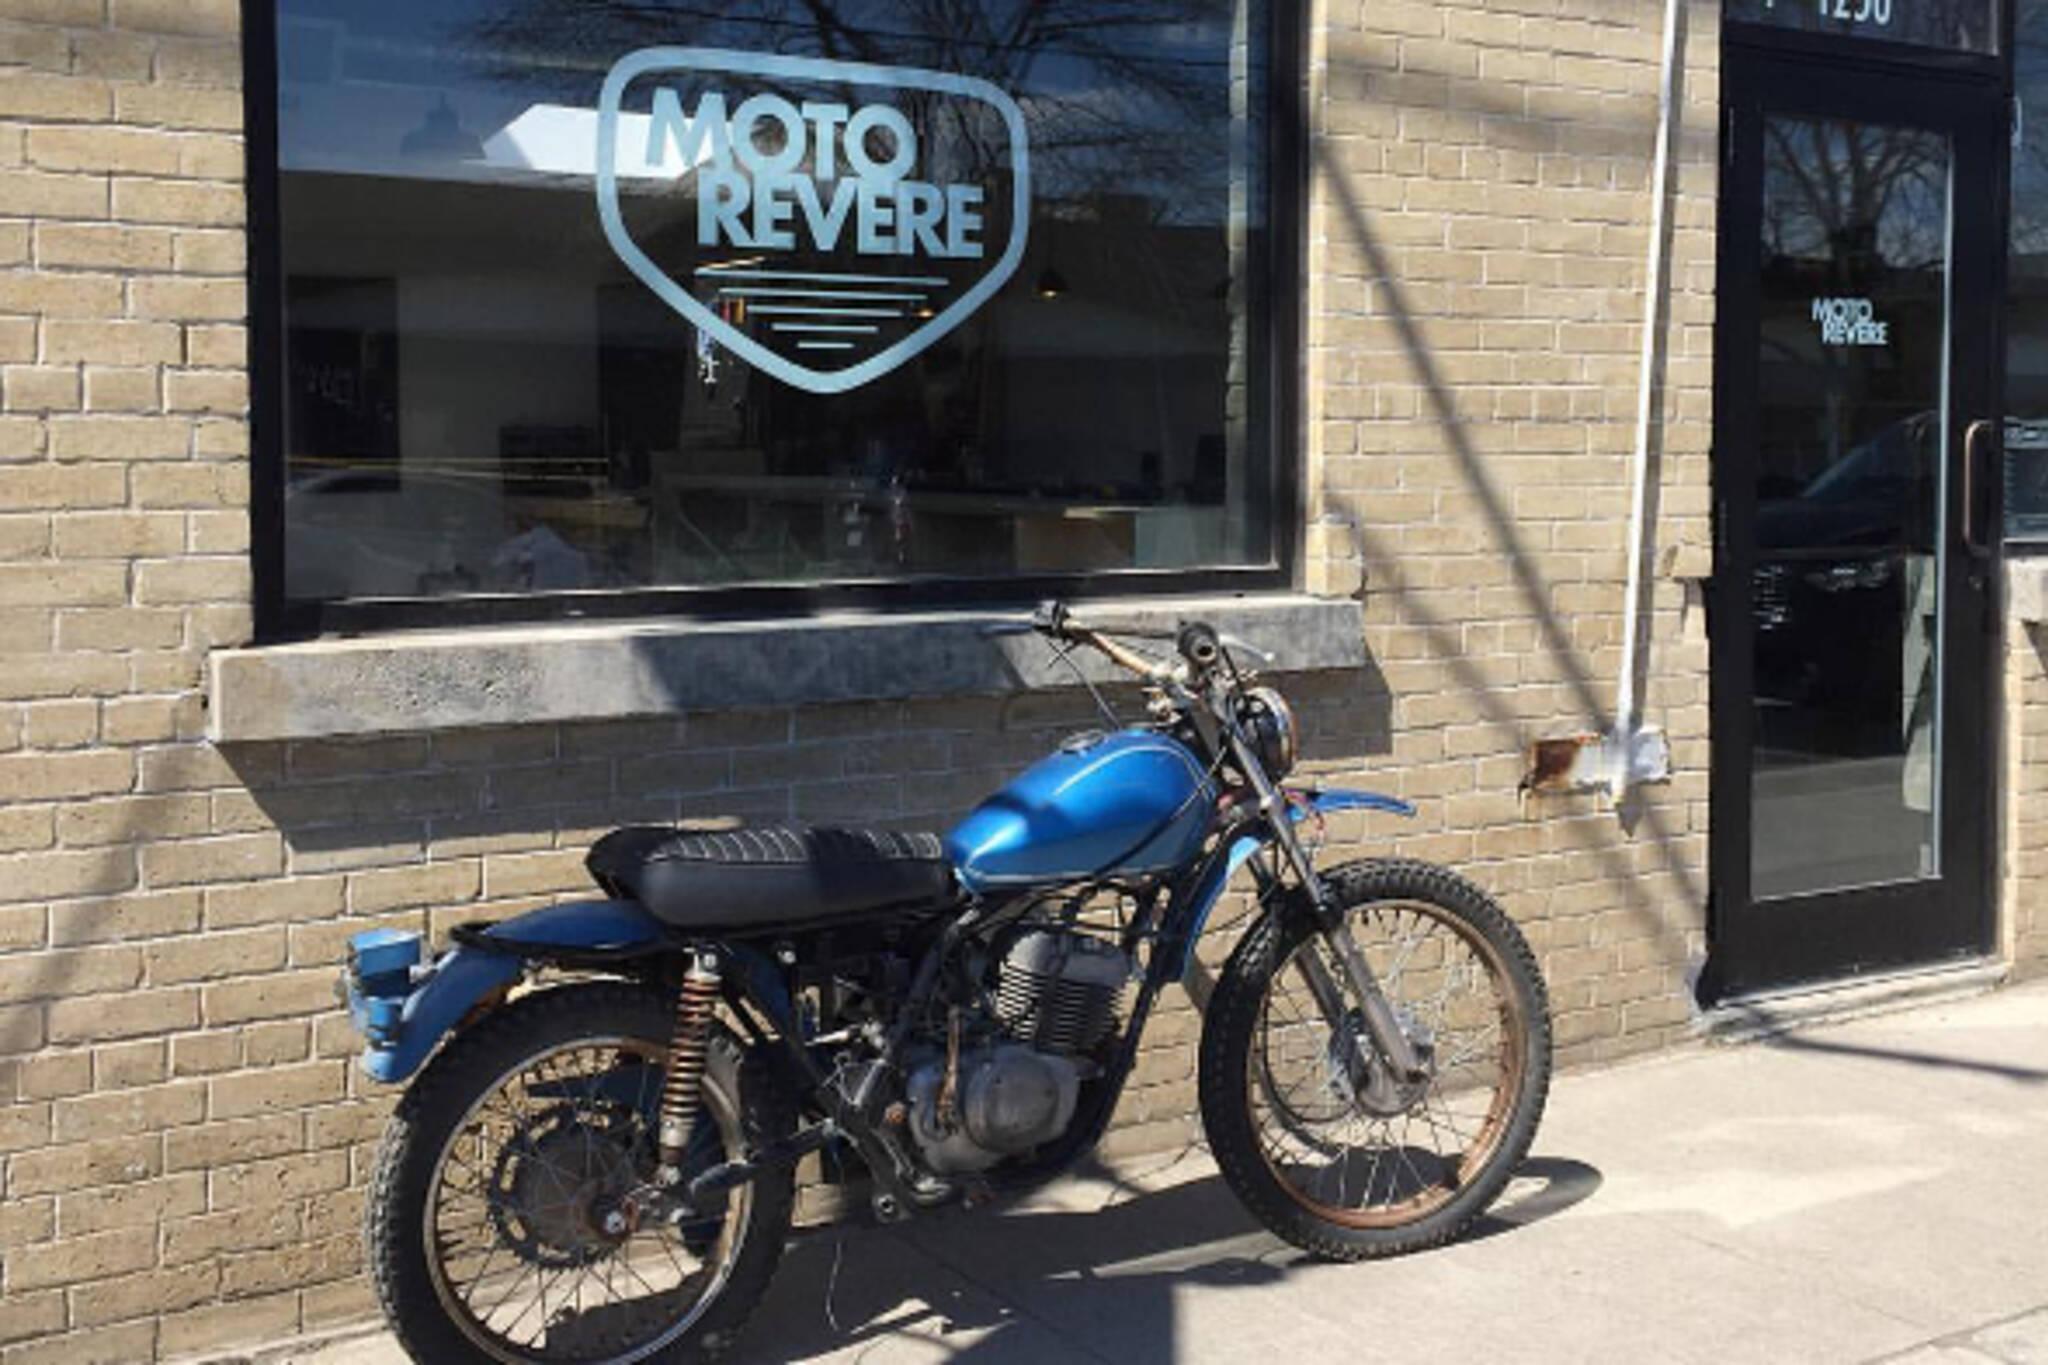 Toronto gets its first diy motorcycle workshop moto revere toronto solutioingenieria Choice Image